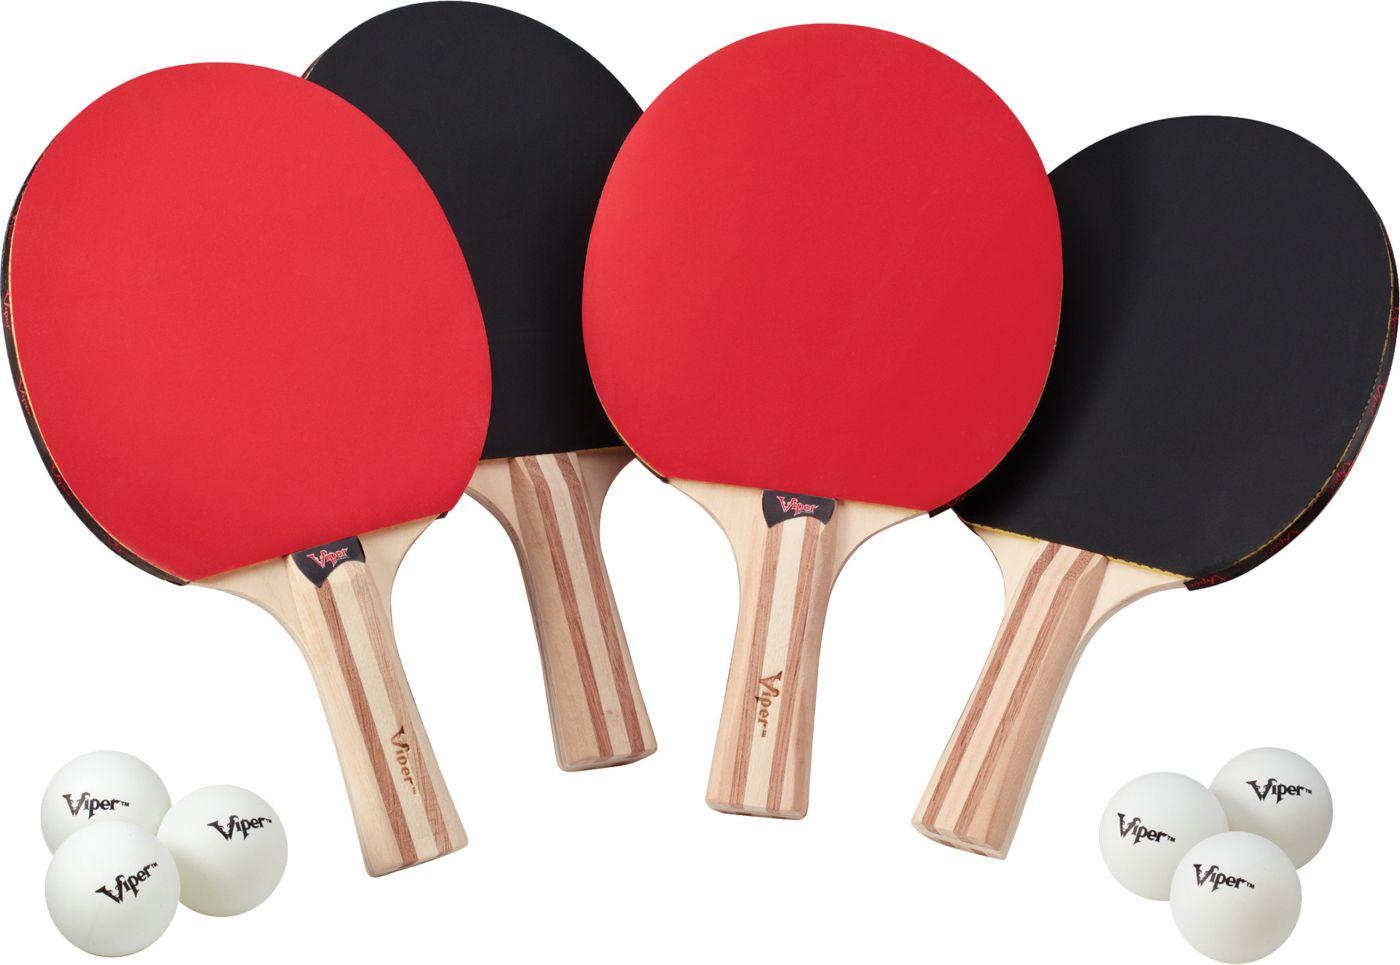 Viper Four Table Tennis Racket Set